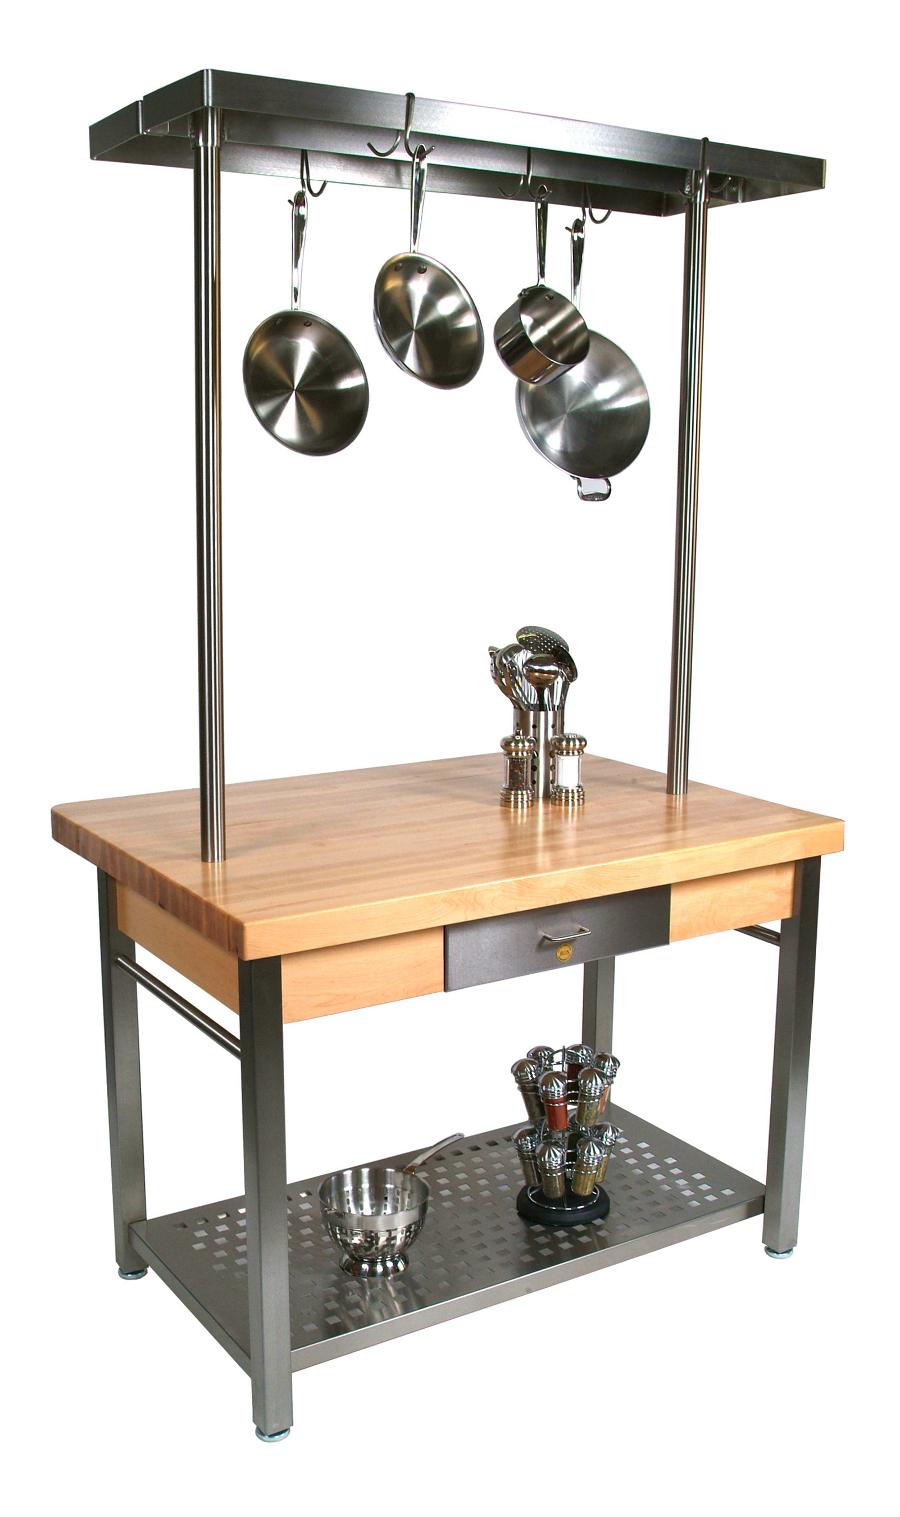 cugrwota kitchen prep tables John Boos Cucina Grande Kitchen Work Table Model GUCG